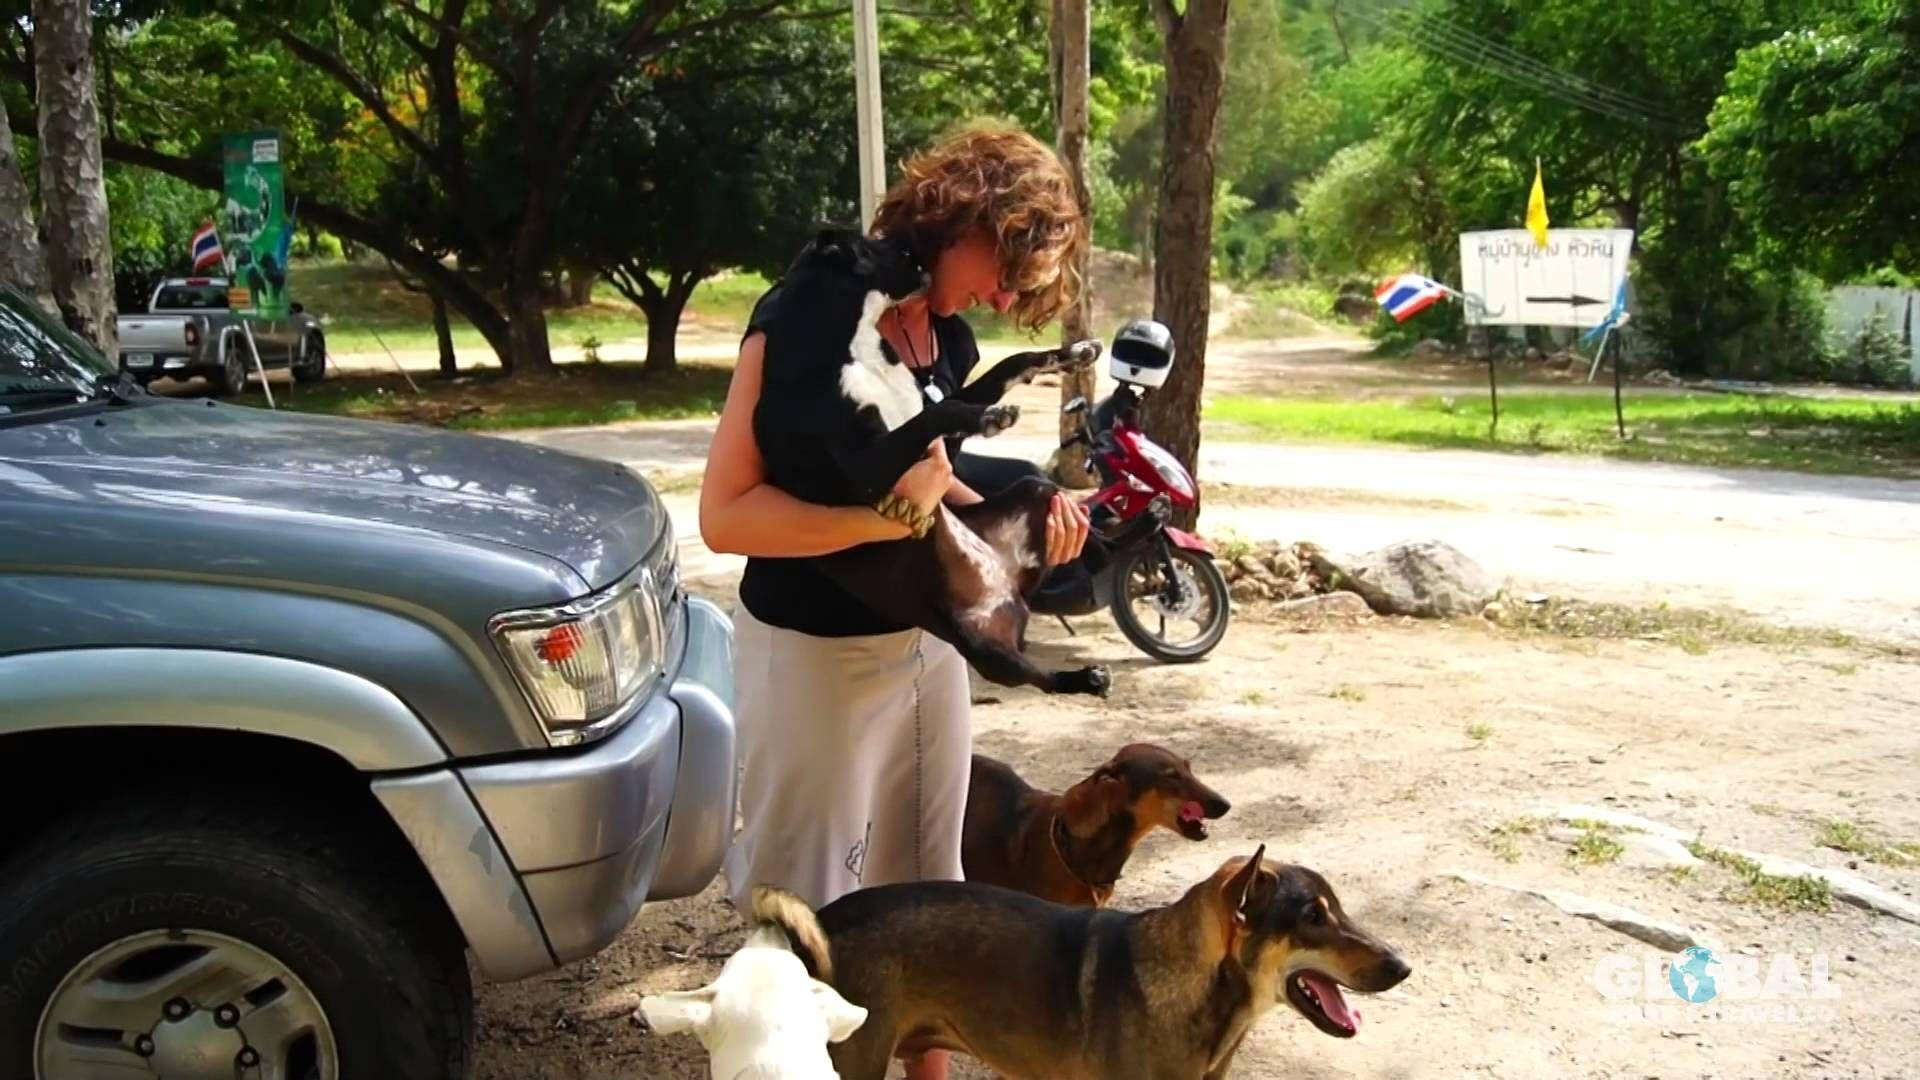 Professional veterinarian Terri from Australia volunteered